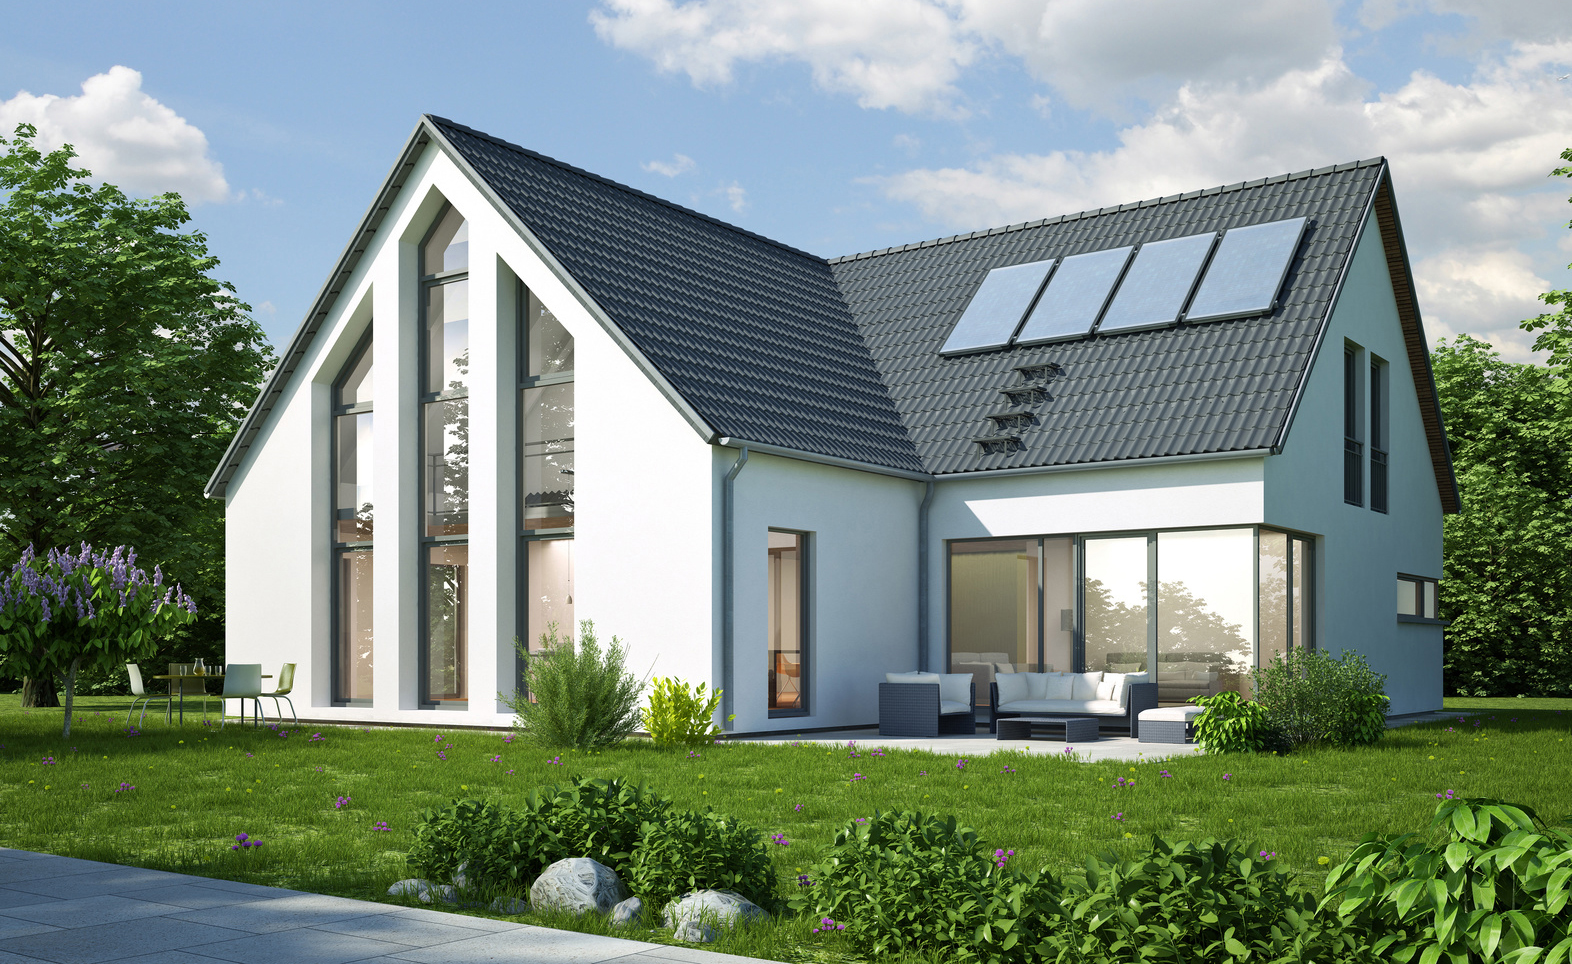 kemptner finanzierung beratung immobilien kemptner immofinanz. Black Bedroom Furniture Sets. Home Design Ideas